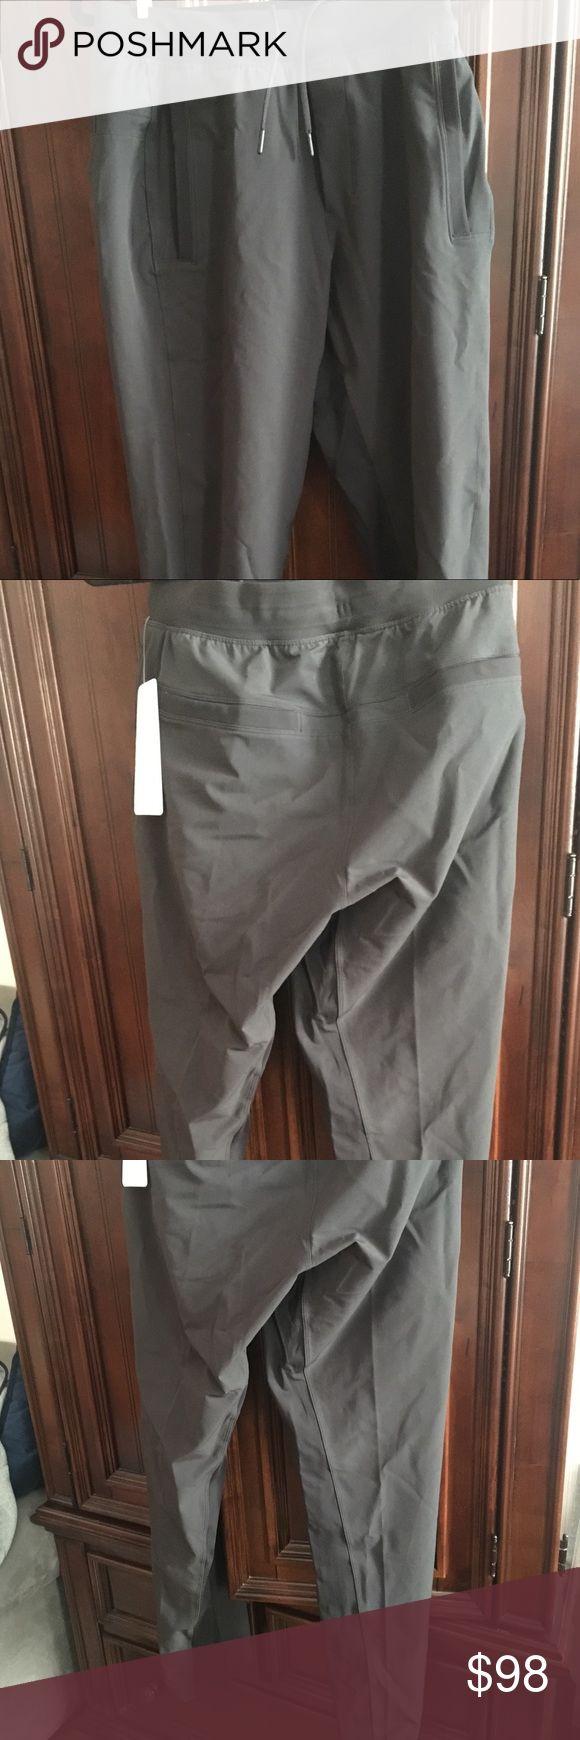 Lululemon men's workout pants Long pants with zippered pockets and back pockets lululemon athletica Pants Sweatpants & Joggers